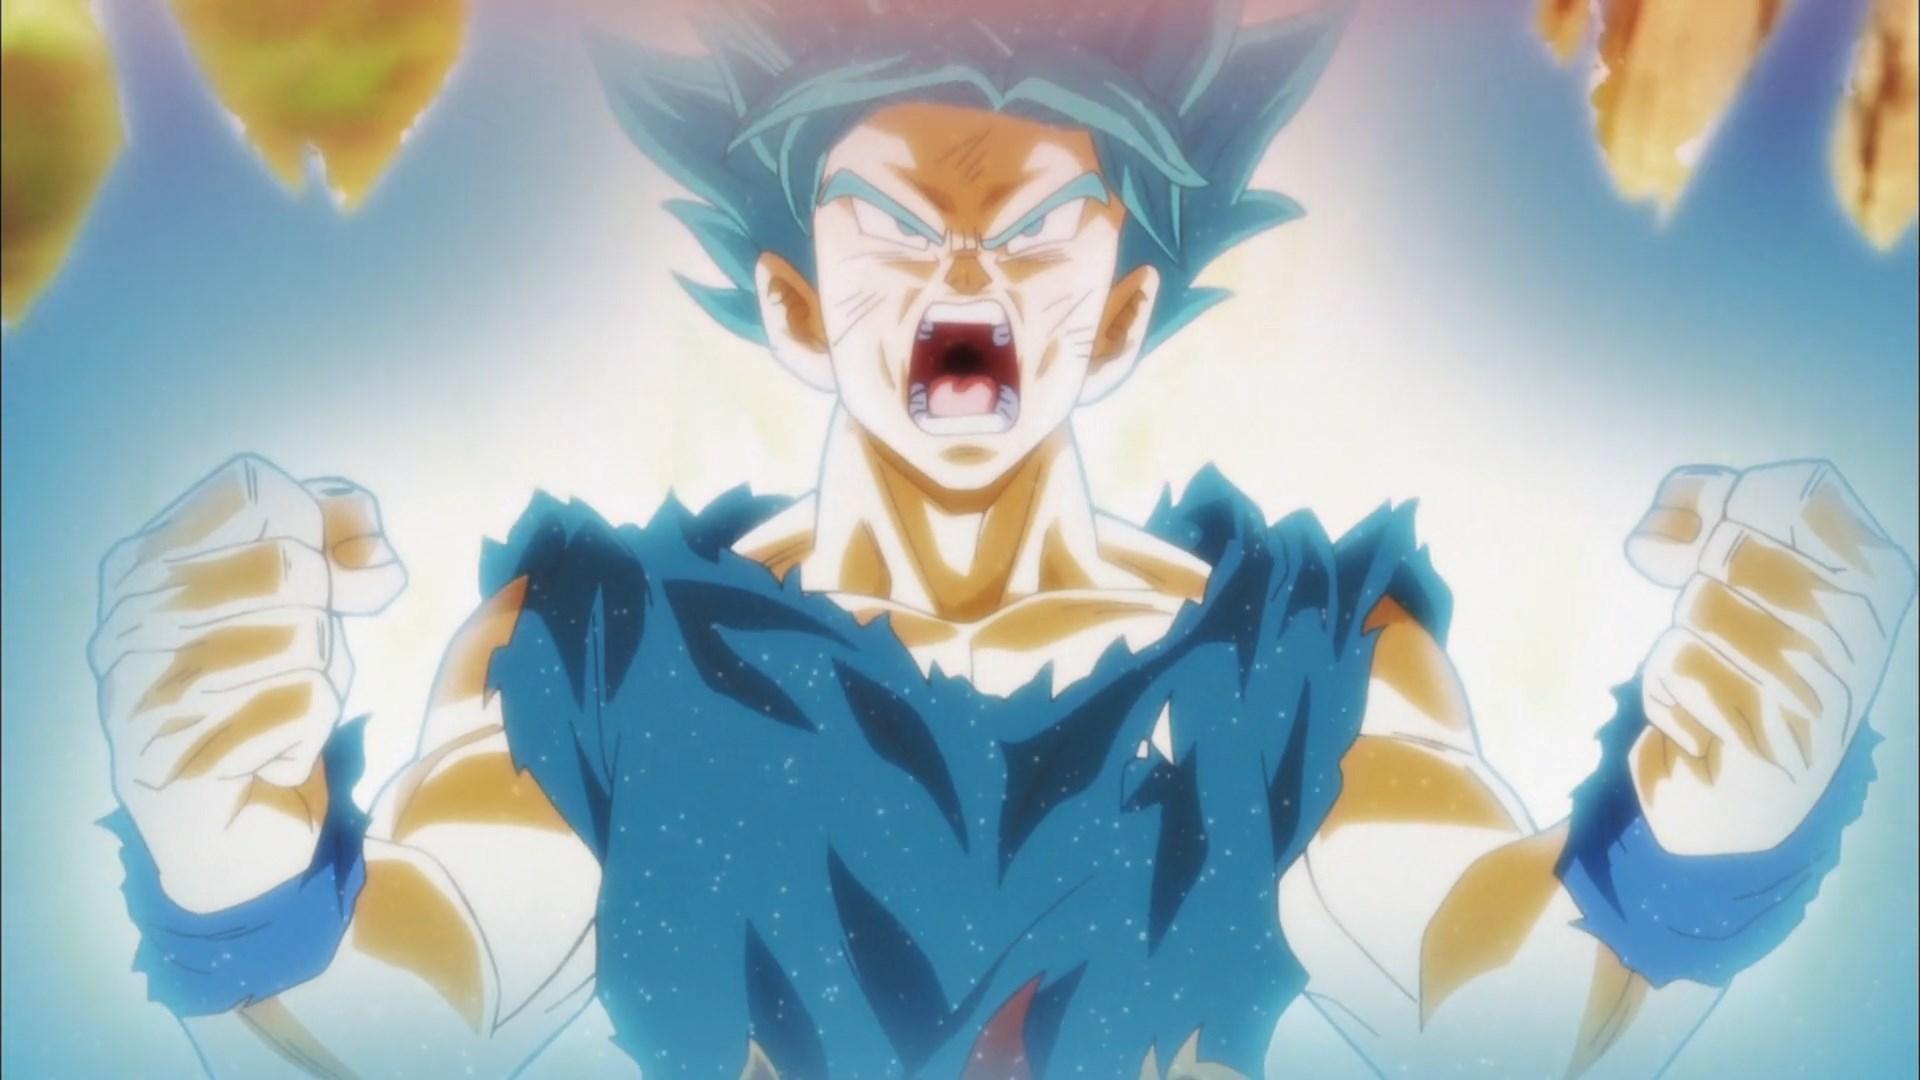 [HorribleSubs] Dragon Ball Super - 121 [1080p].mkv_snapshot_16.56